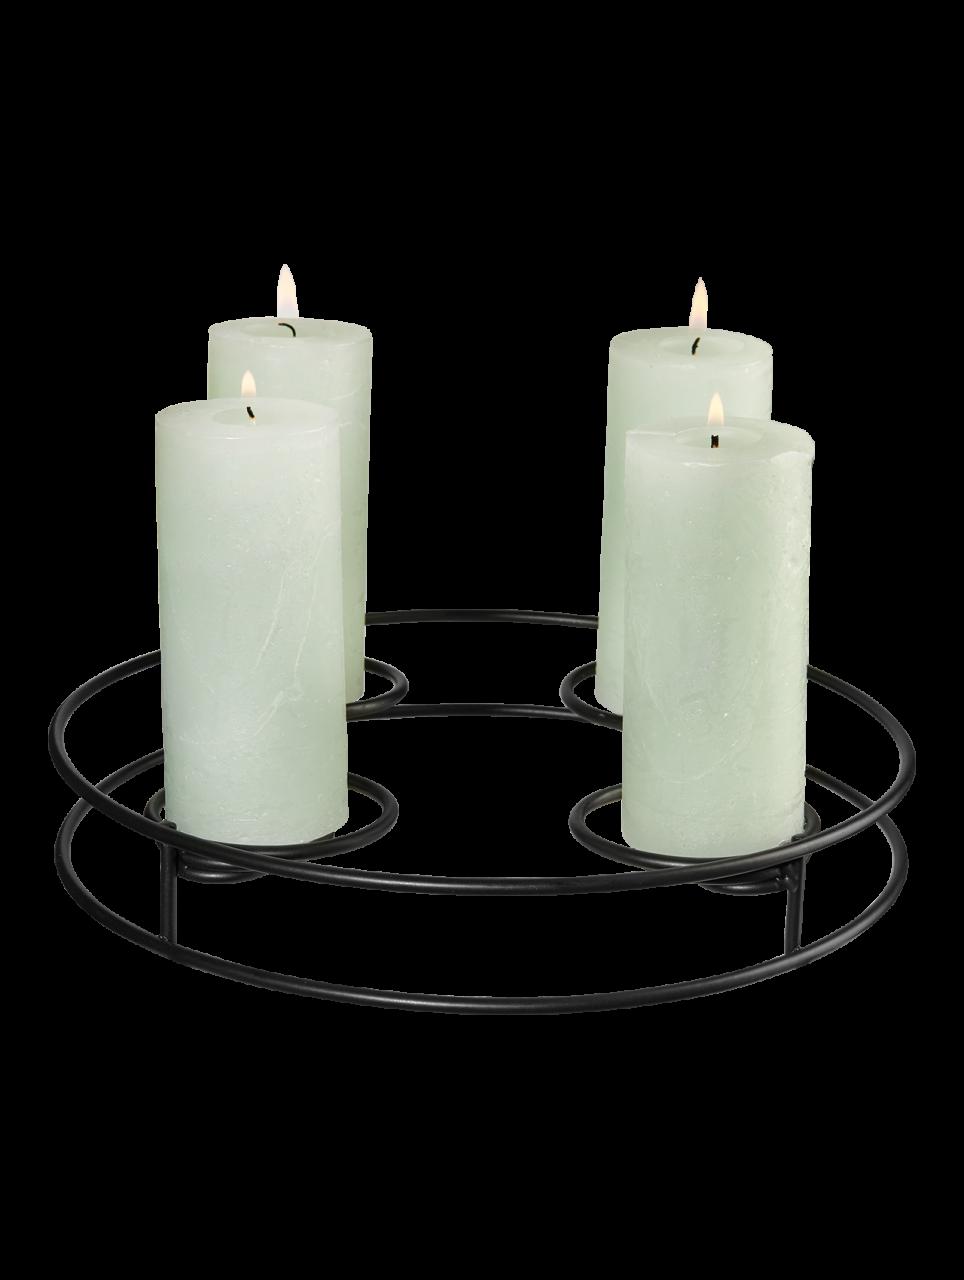 Kerzenständer rund, multifunktional